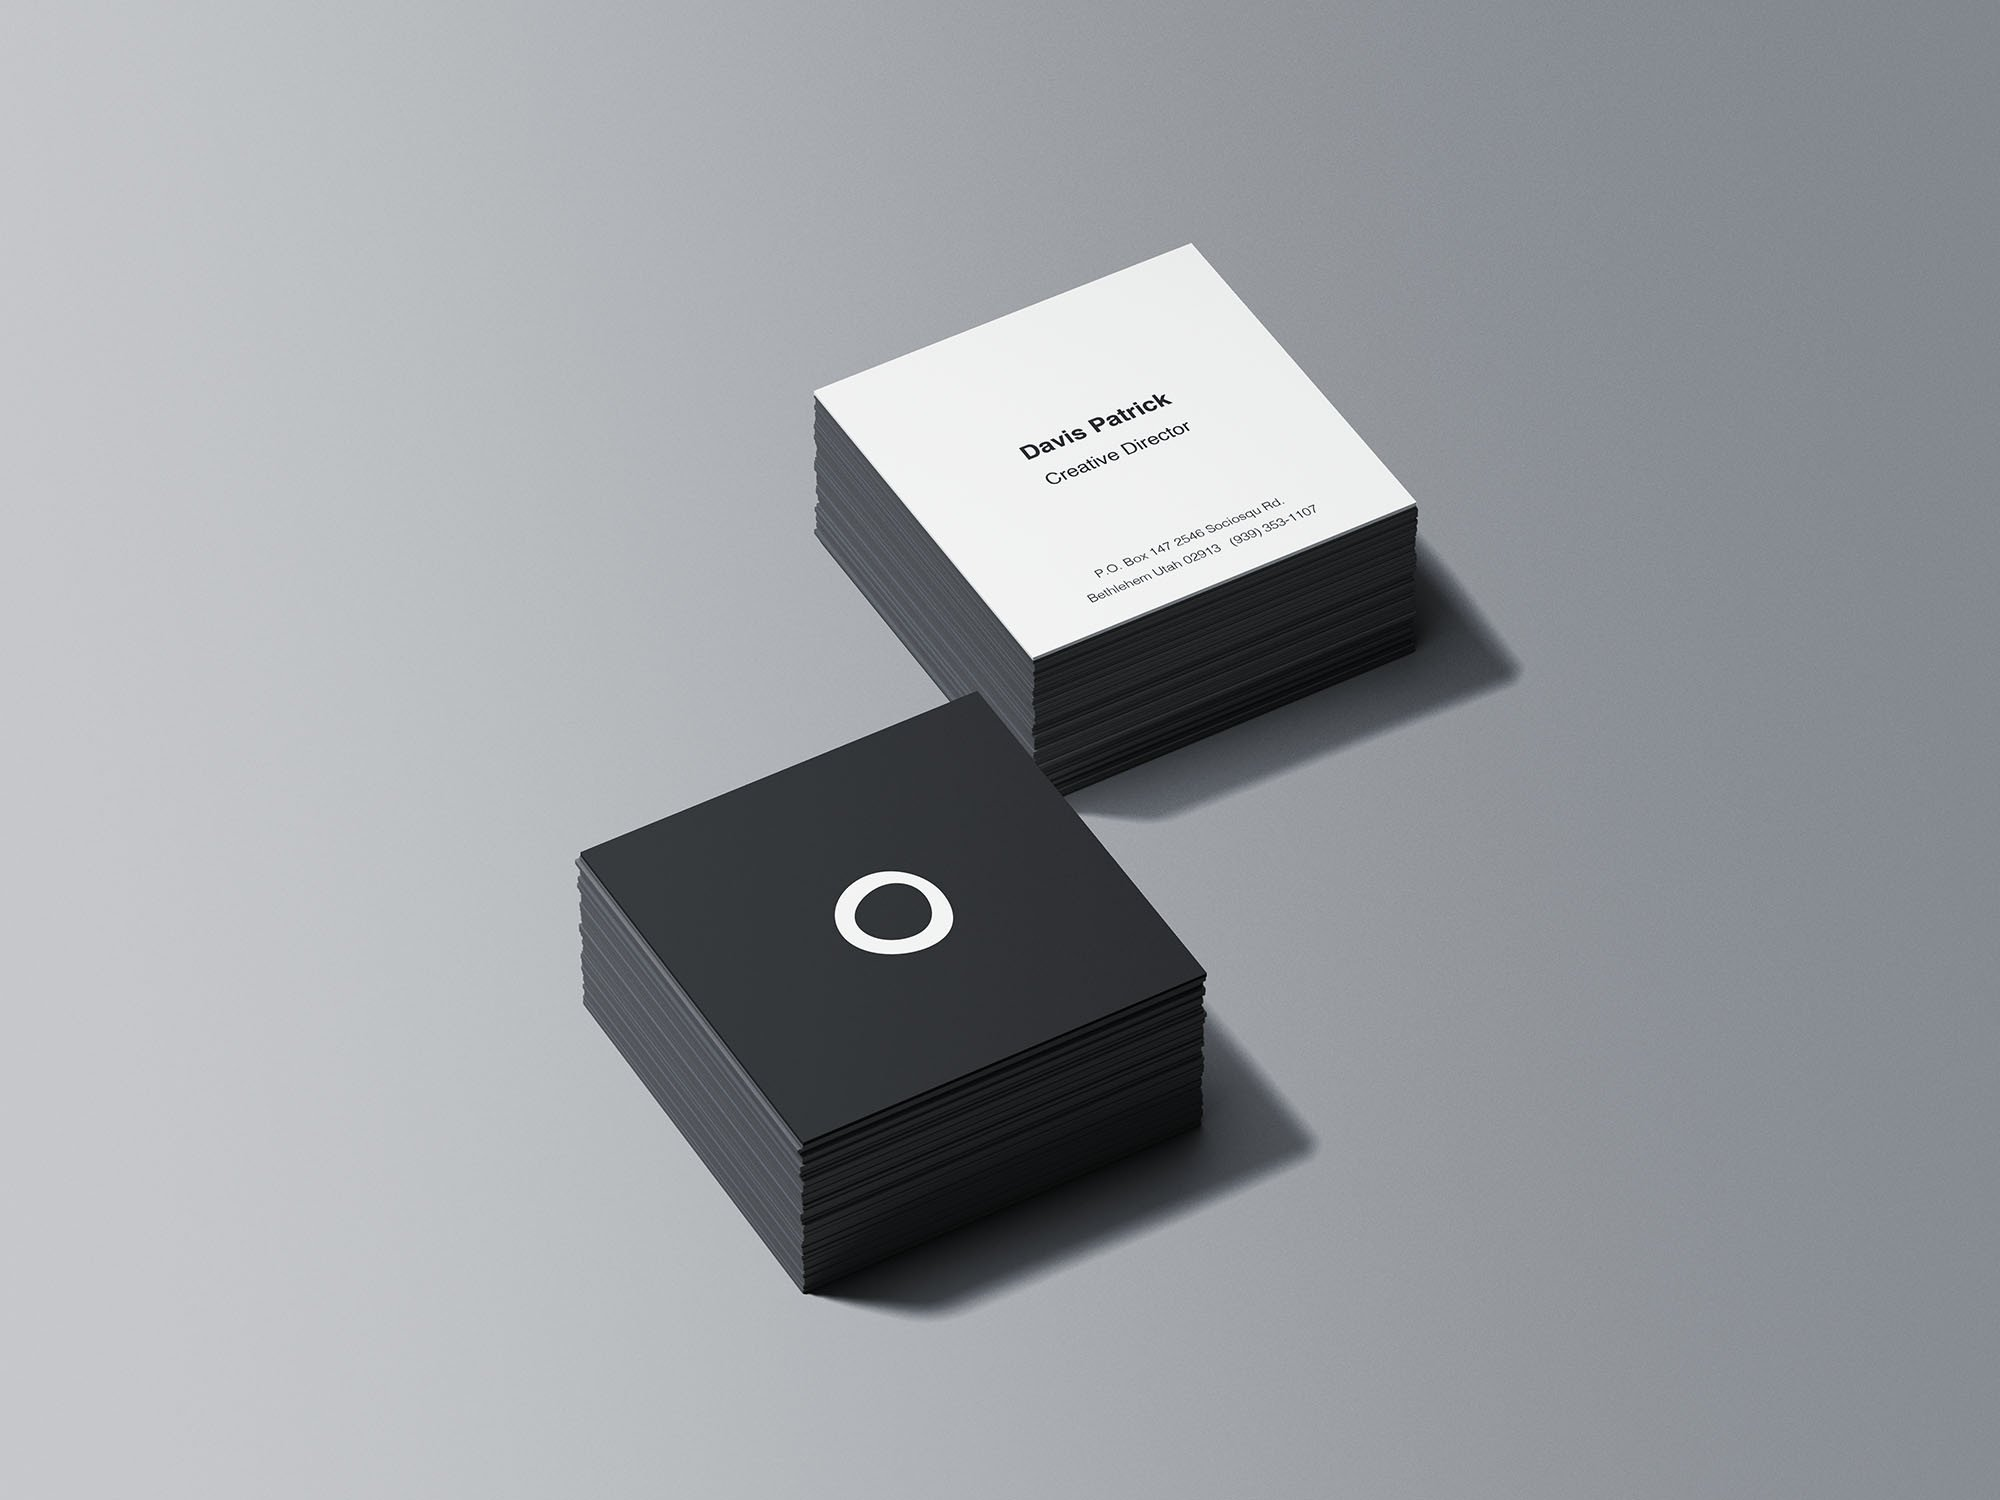 Square Business Card Mockup Square Business Card Stacks Mockup